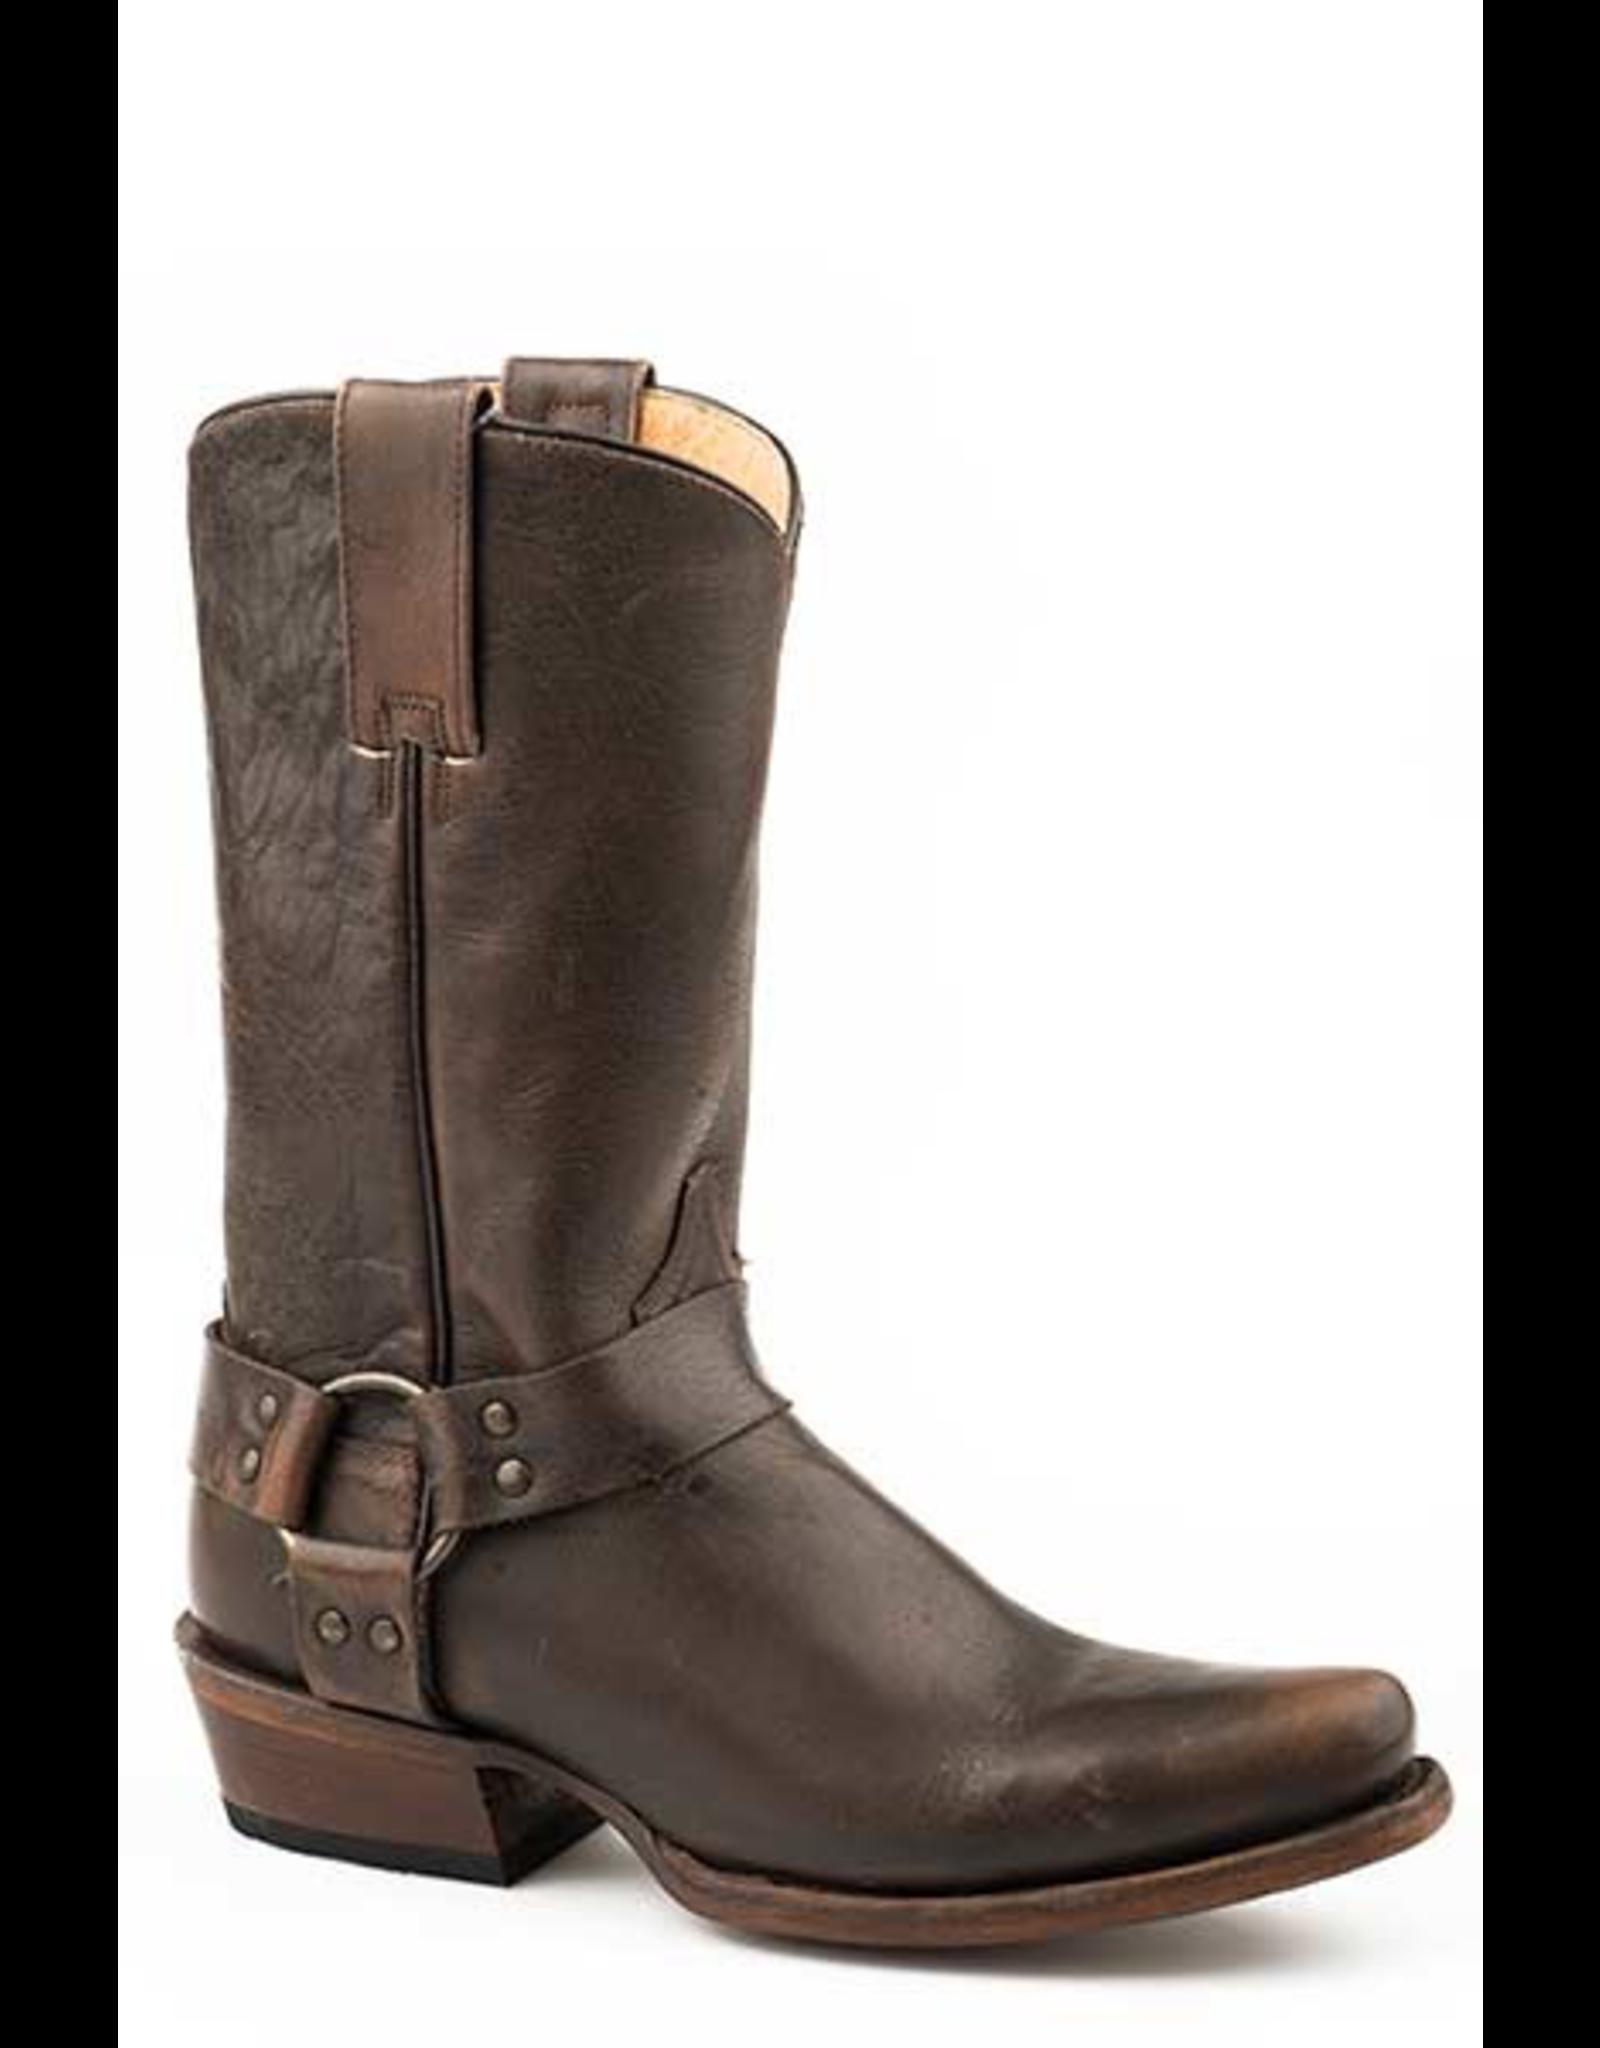 Boots-Women ROPER Plain Ole Harness